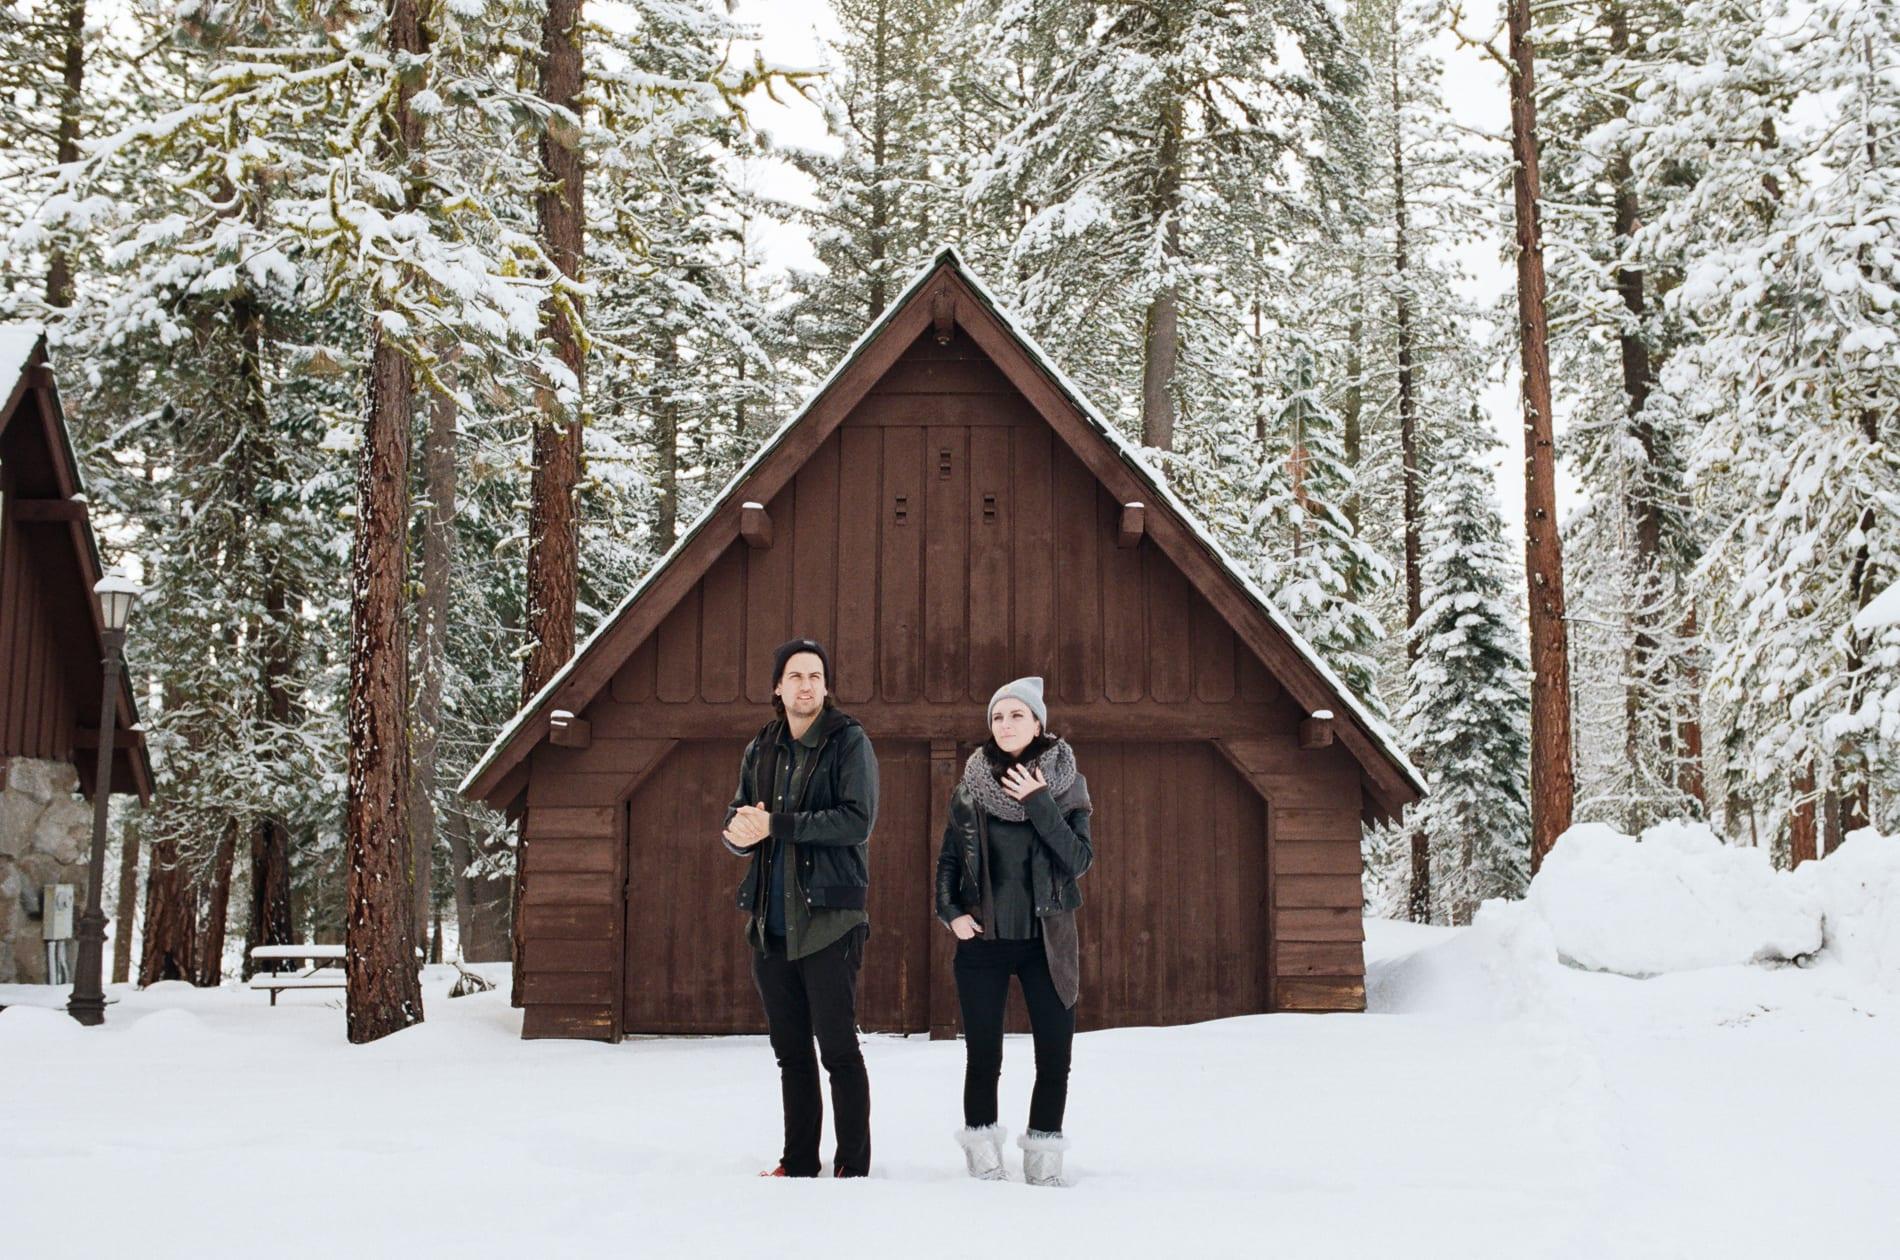 mt-lassen-winter-snow-couples-photo-5